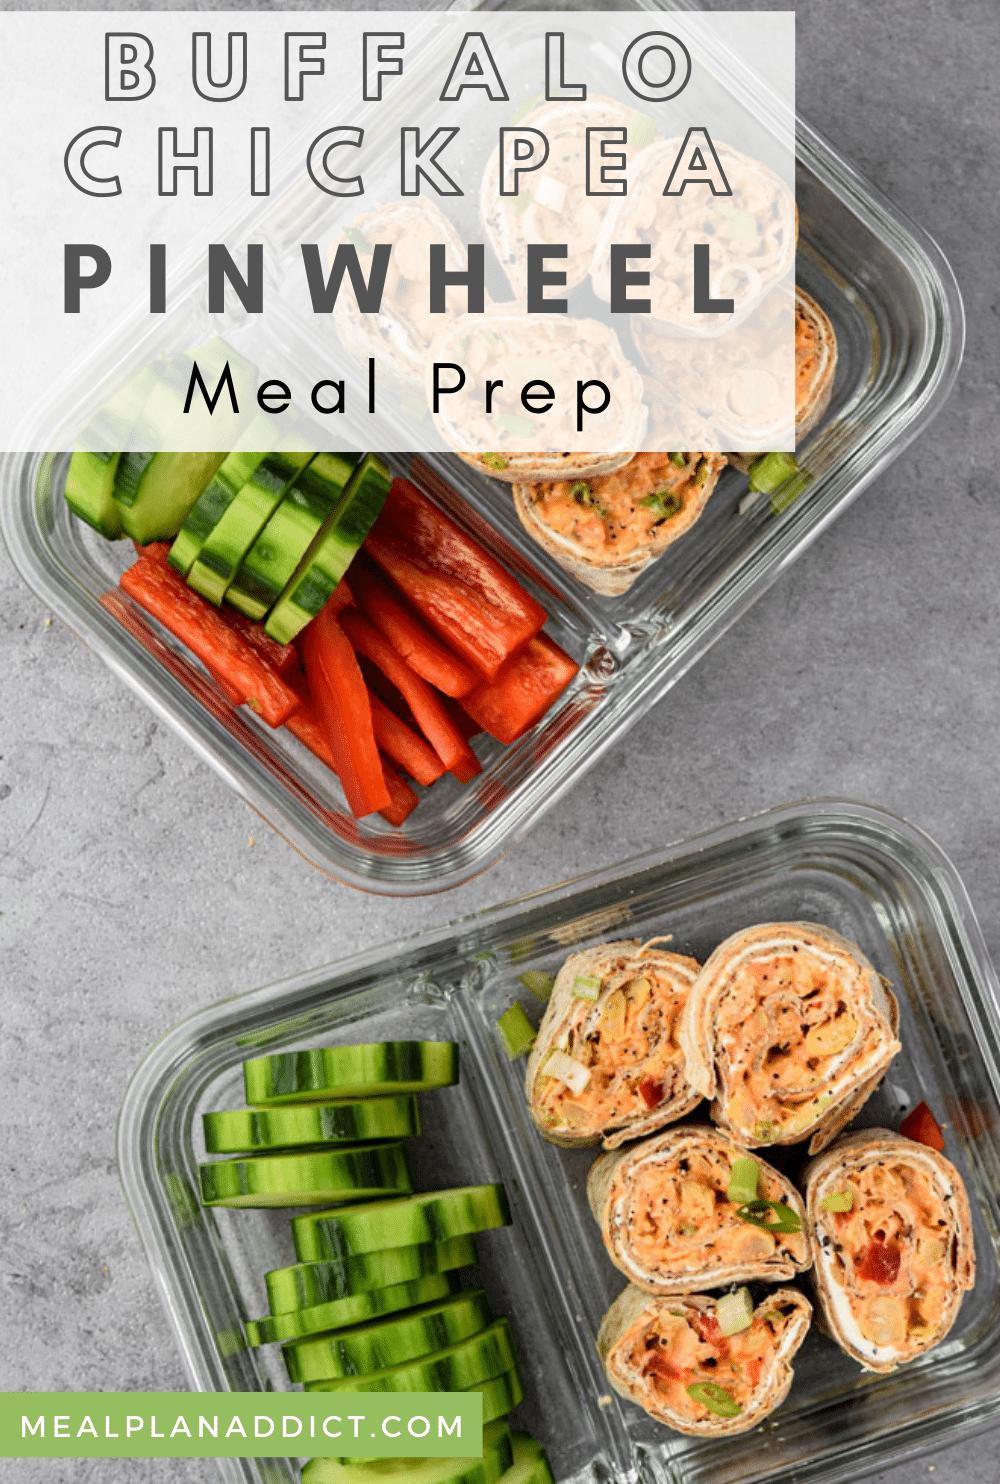 Healthy Buffalo Chickpea Pinwheel Meal Prep | Meal Plan Addict